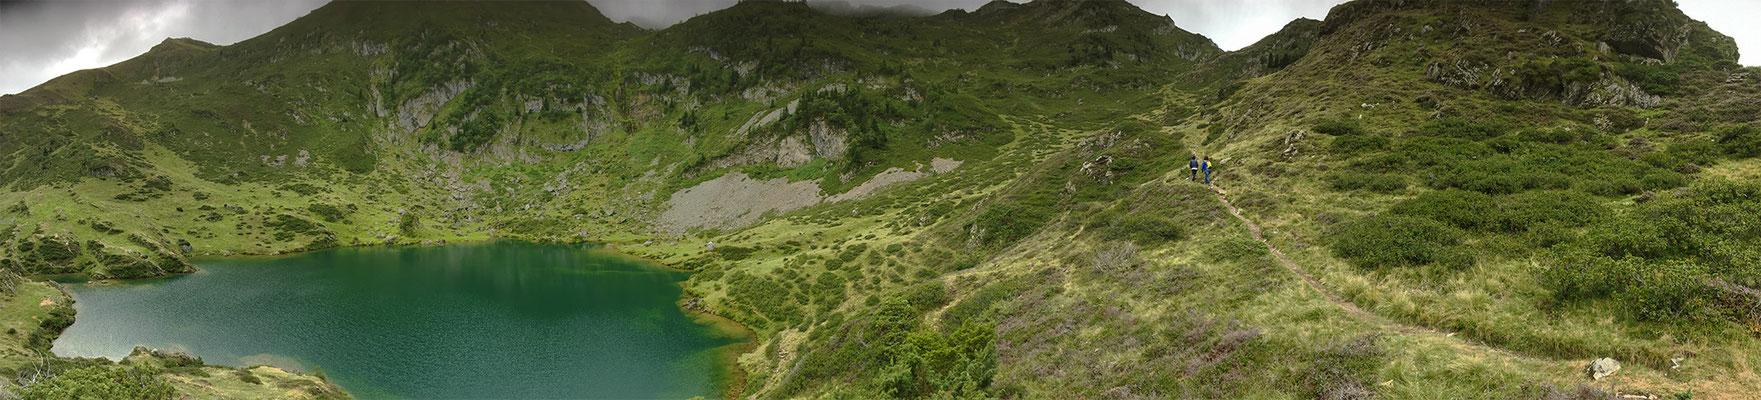 Pano montagne lac 2